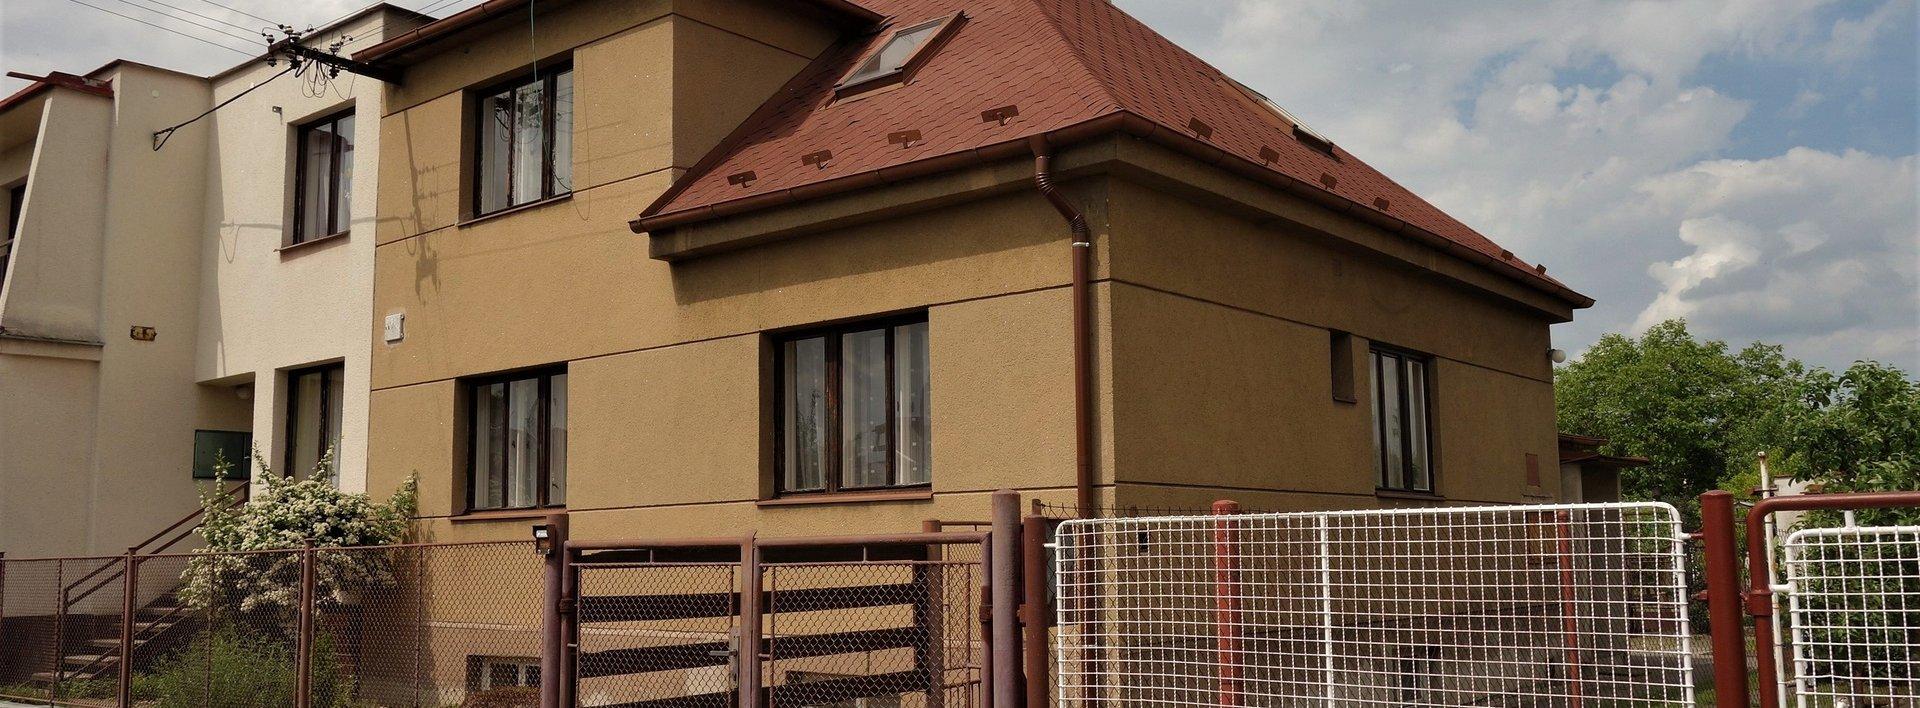 Rodinný dům (5+1) se zahradou, 917 m²,  Pardubice - Studánka, Ev.č.: N48456